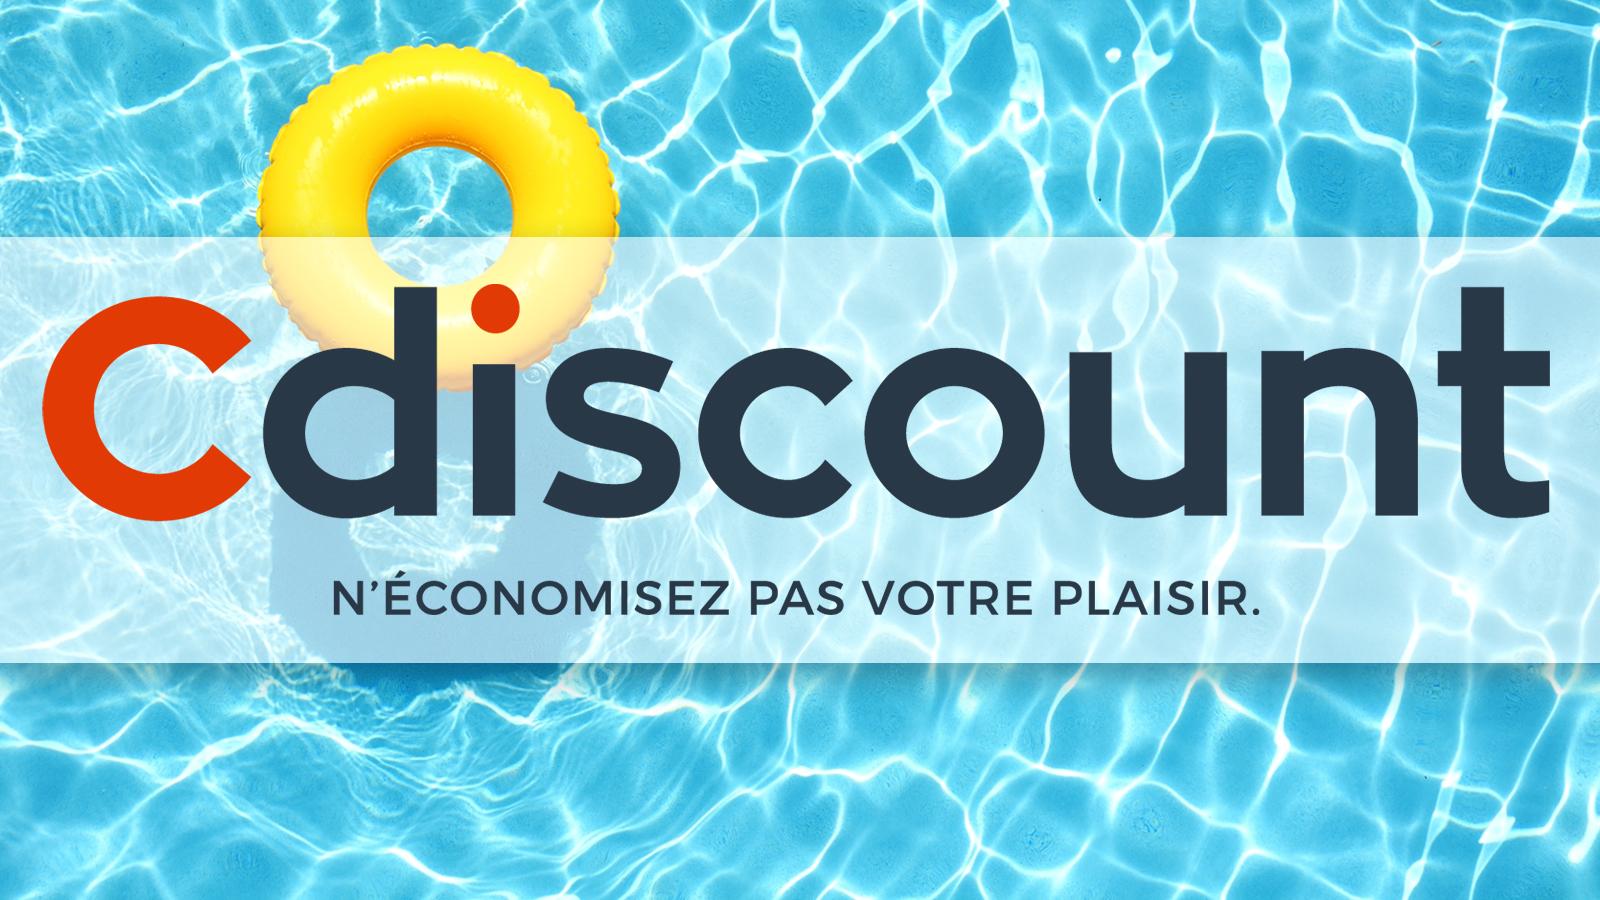 Carte Steam Cdiscount.Soldes Cdiscount Les 5 Meilleurs Bons Plans A Saisir